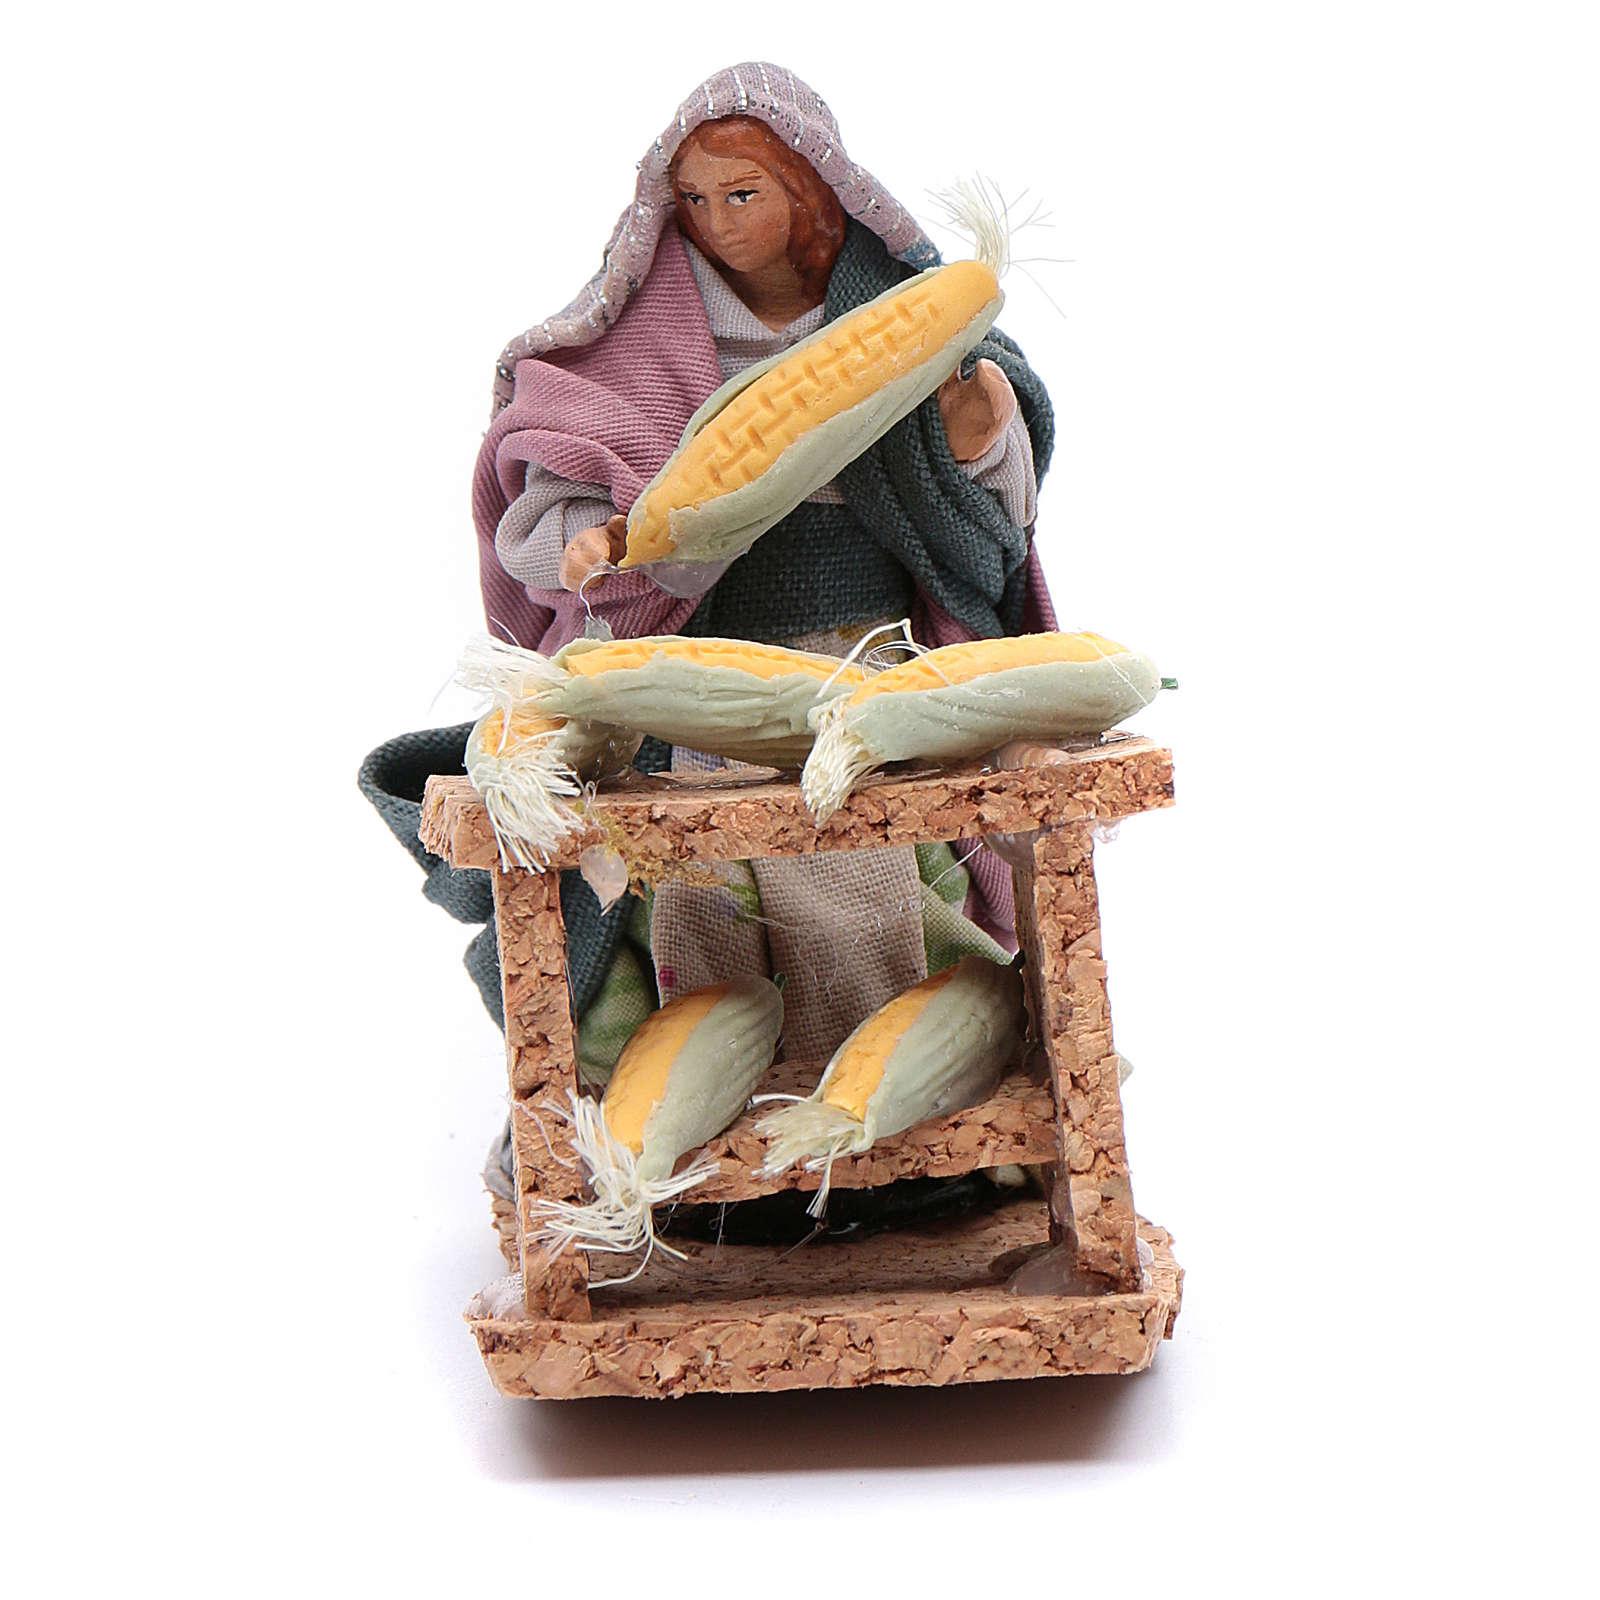 Donna con pannocchie statuina presepe napoletano 8 cm 4